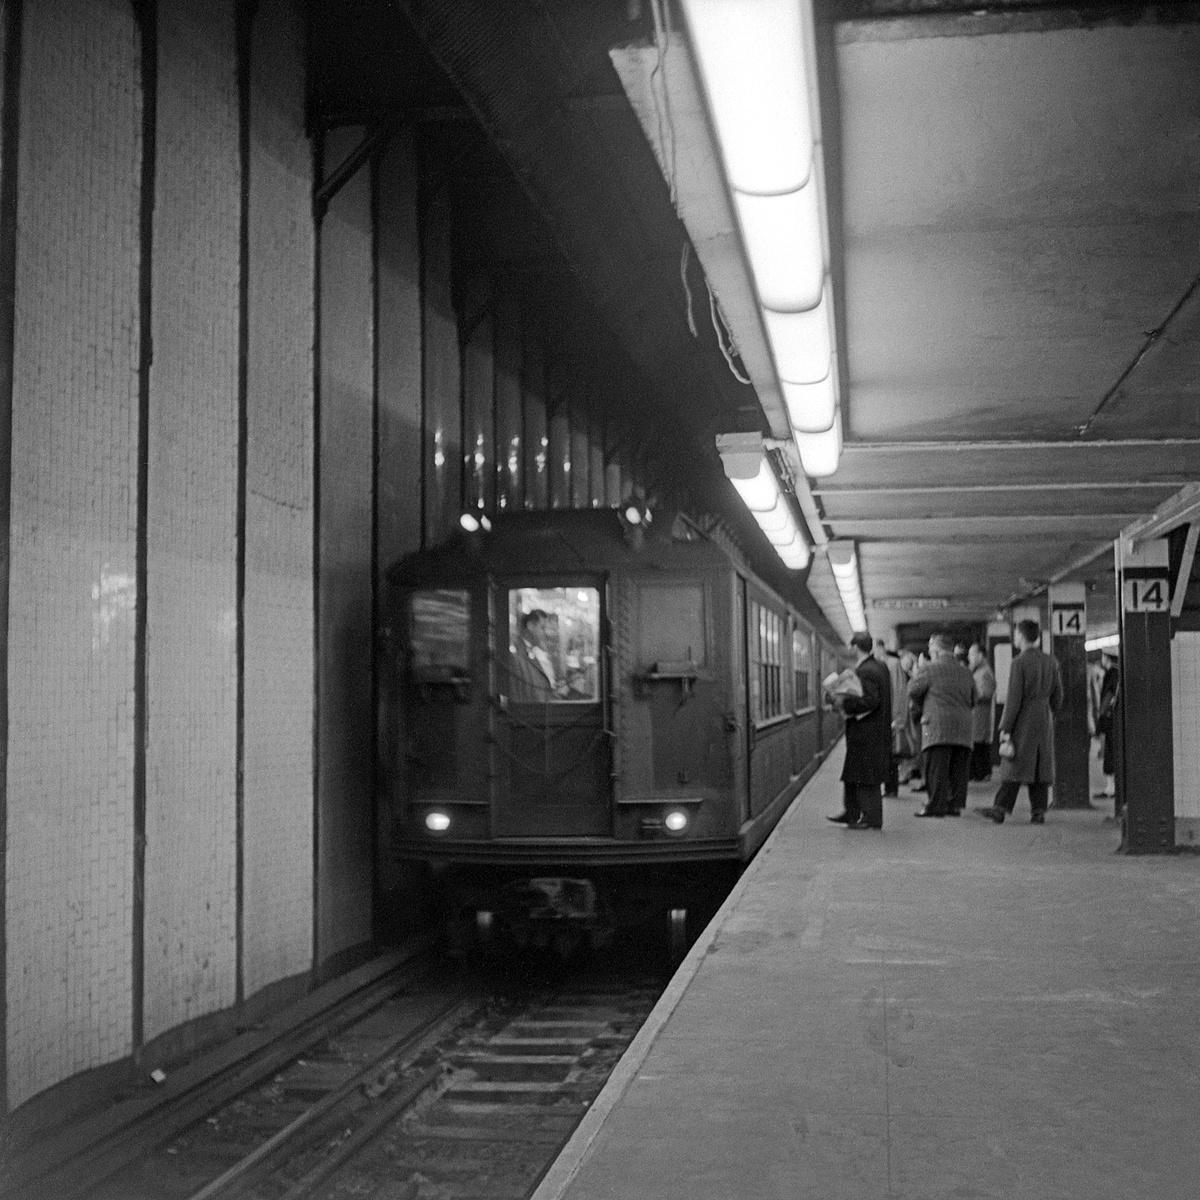 (562k, 1200x1200)<br><b>Country:</b> United States<br><b>City:</b> New York<br><b>System:</b> New York City Transit<br><b>Line:</b> IRT East Side Line<br><b>Location:</b> 14th Street/Union Square <br><b>Car:</b> Low-V  <br><b>Collection of:</b> David Pirmann<br><b>Notes:</b> Low-V train at 14th Street-Lexington Ave Local<br><b>Viewed (this week/total):</b> 8 / 221